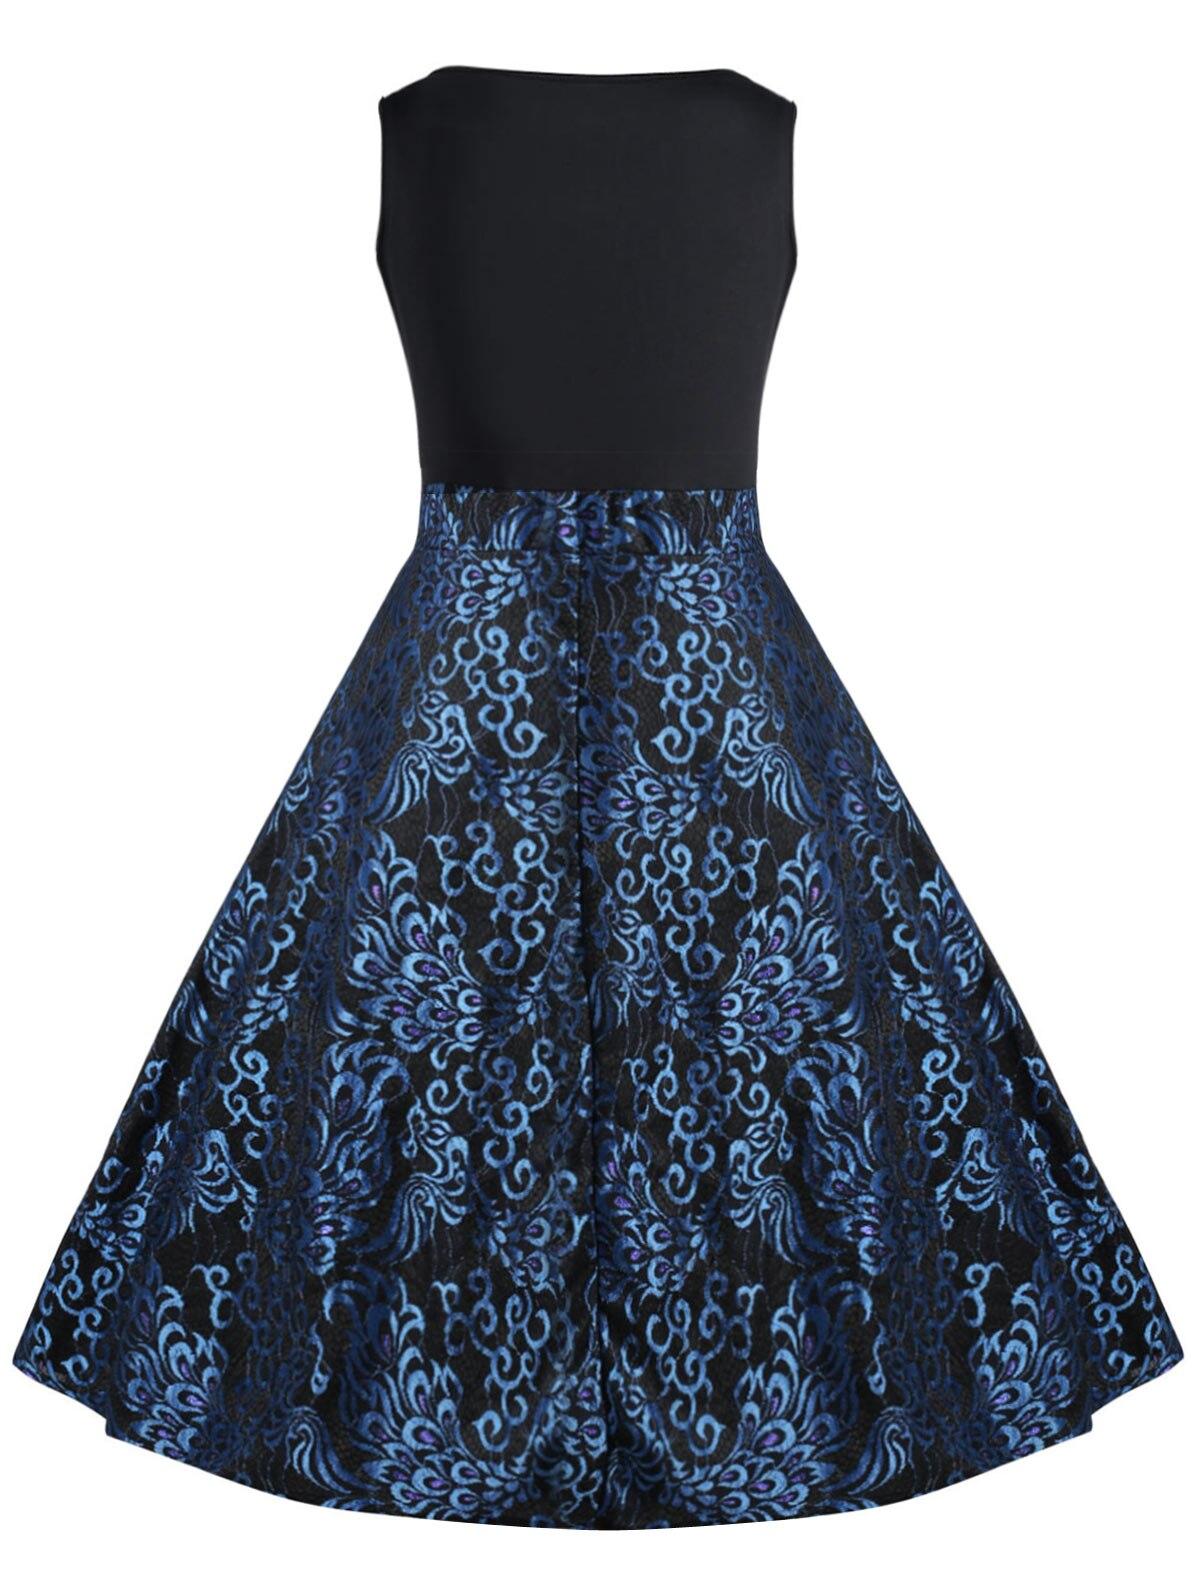 US $14.14 Wipalo Frauen Plus Größe XL 14XL Paisley Midi 19140 s Vintage  Kleid Neue Mode Frühjahr V ausschnitt Midi Pin Up Party Kleid vestido